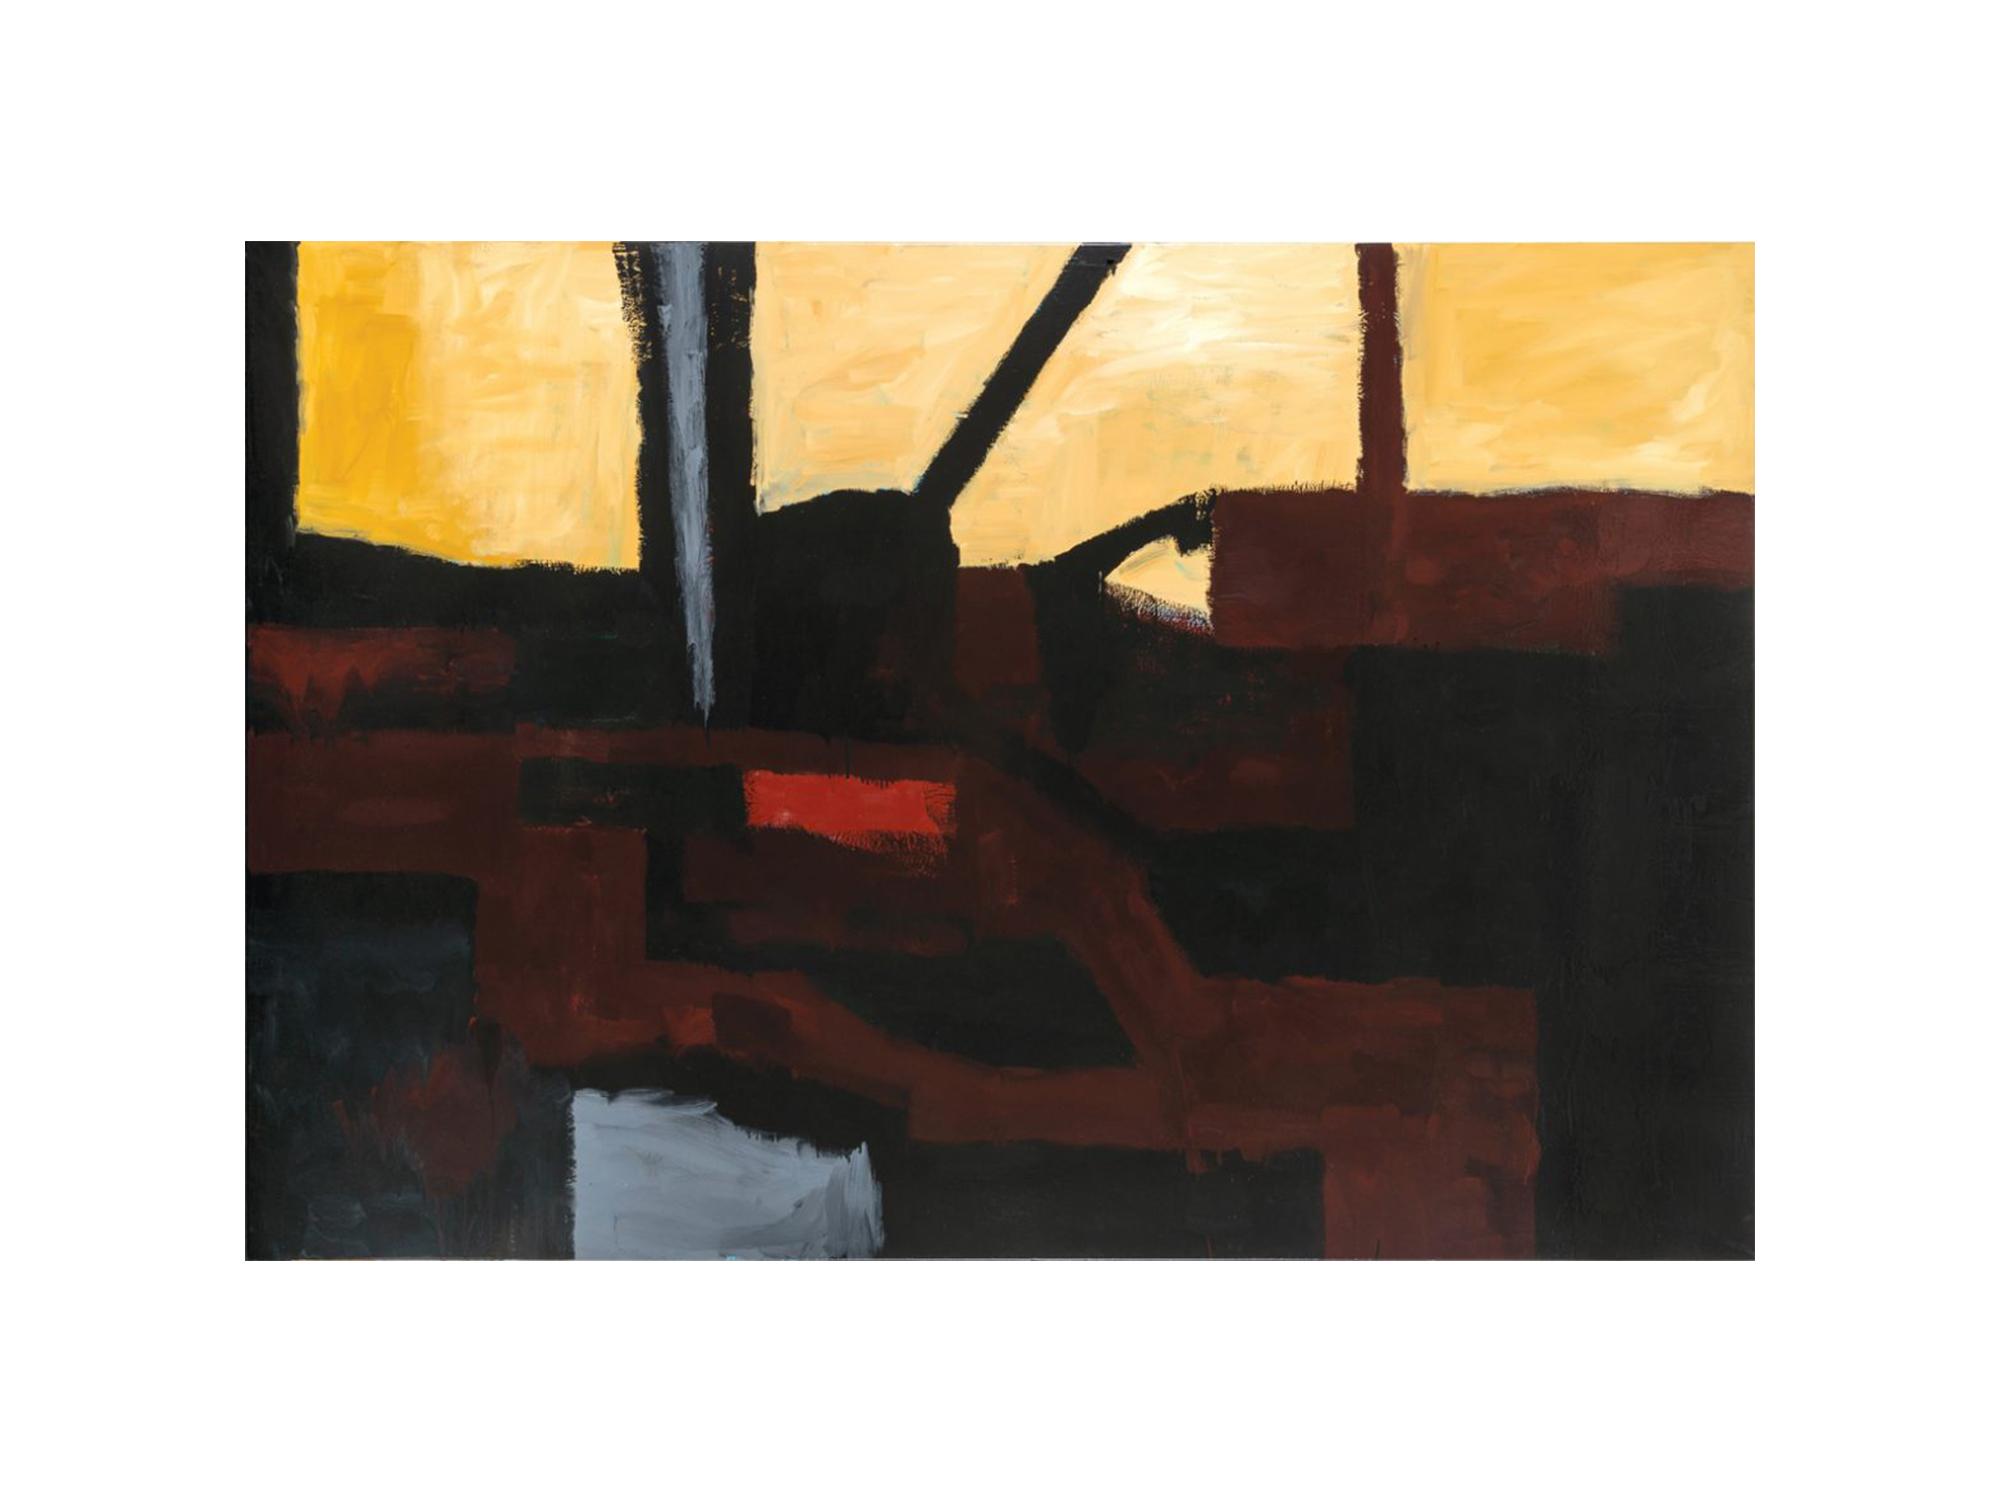 James Clayden   Railway , 2016 enamel on canvas 152 x 229cm   ARTIST BIO